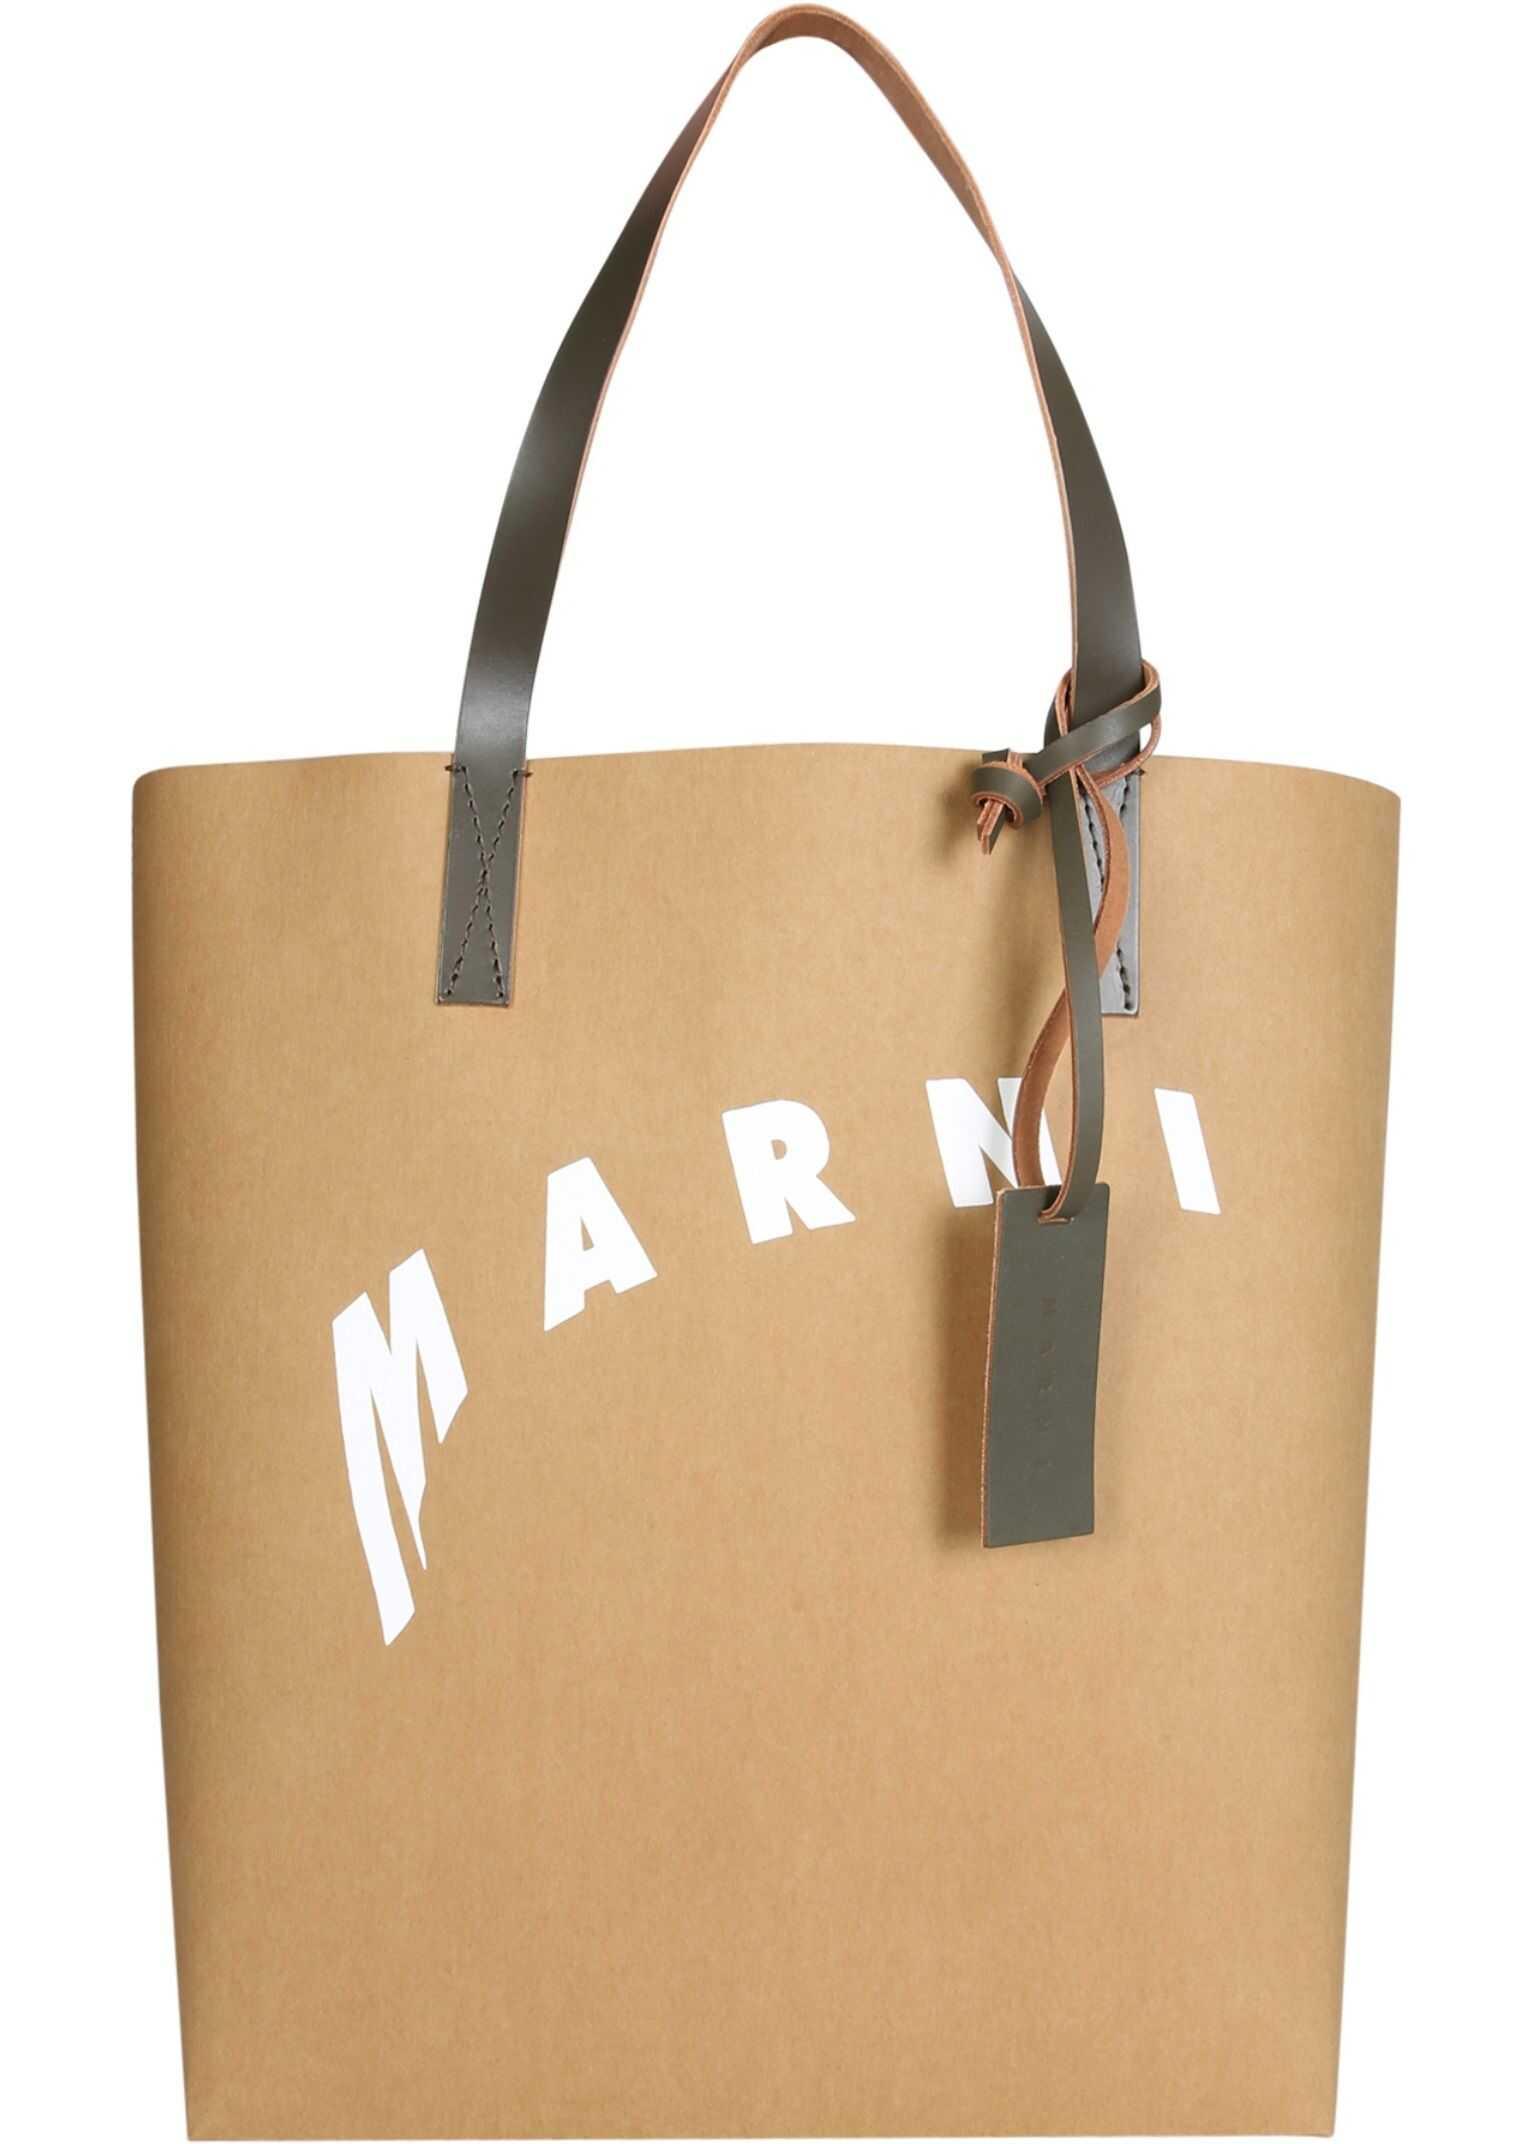 Marni Shopping Bag With Distorted Logo SHMQ0000A8_P3951Z2M94 NUDE imagine b-mall.ro